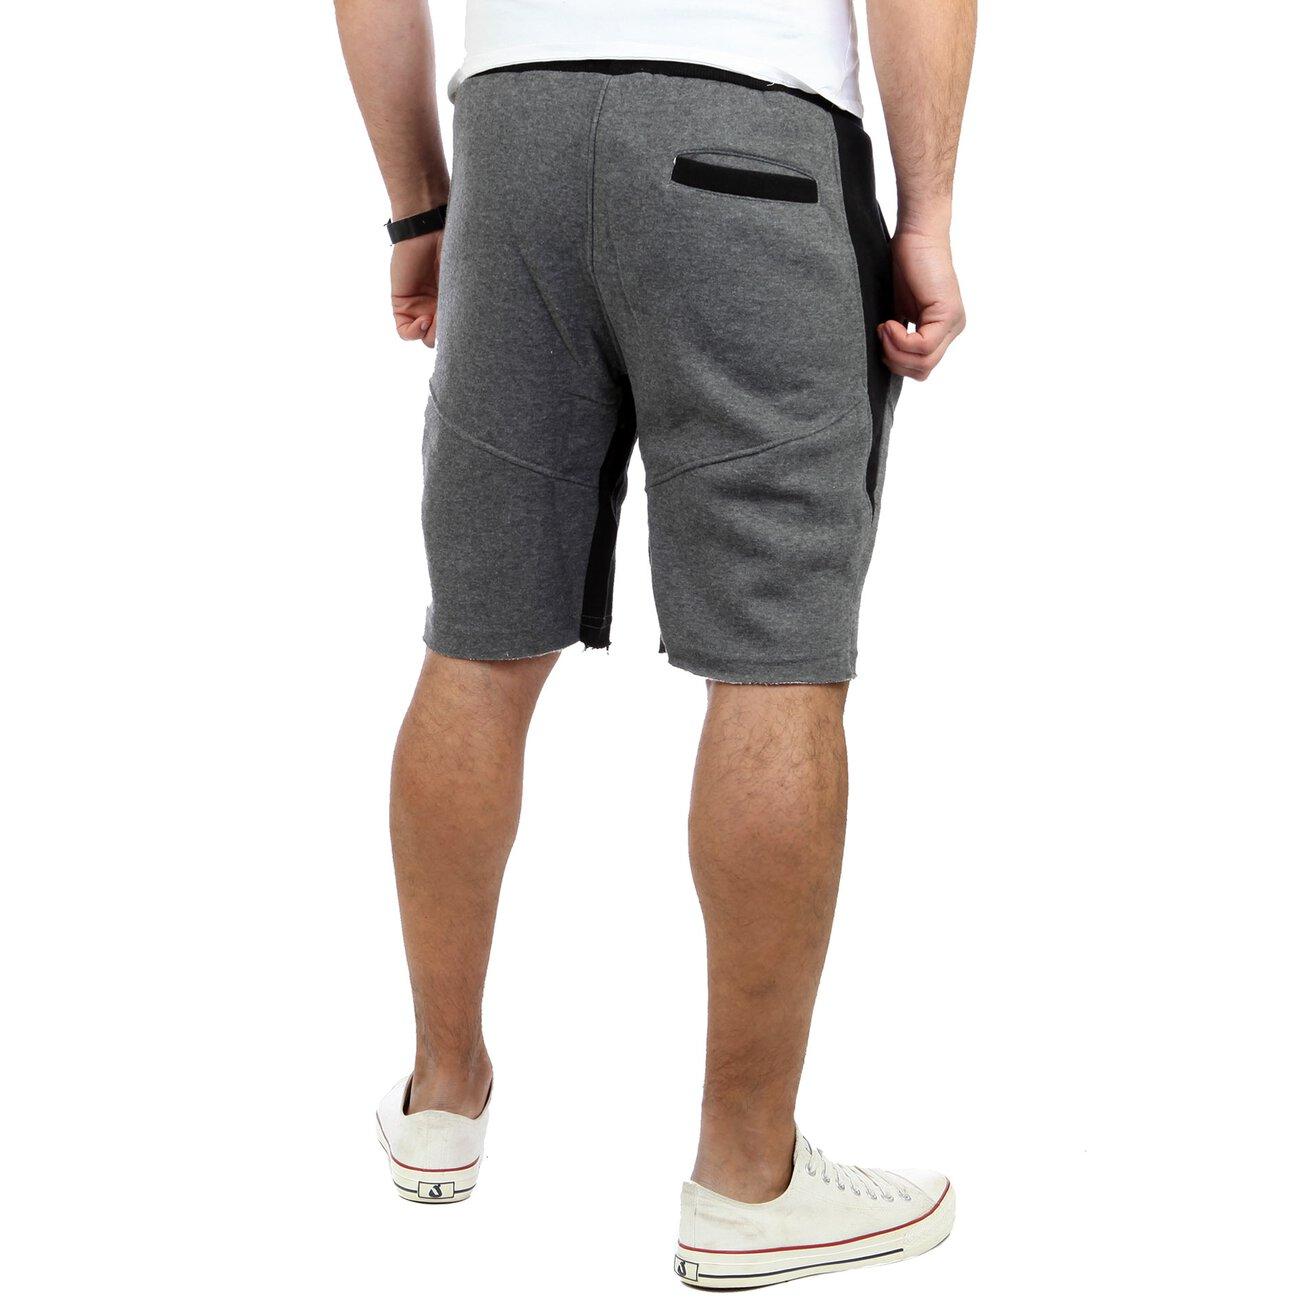 reslad kurze hose herren fitness jogginghose kurz shorts. Black Bedroom Furniture Sets. Home Design Ideas